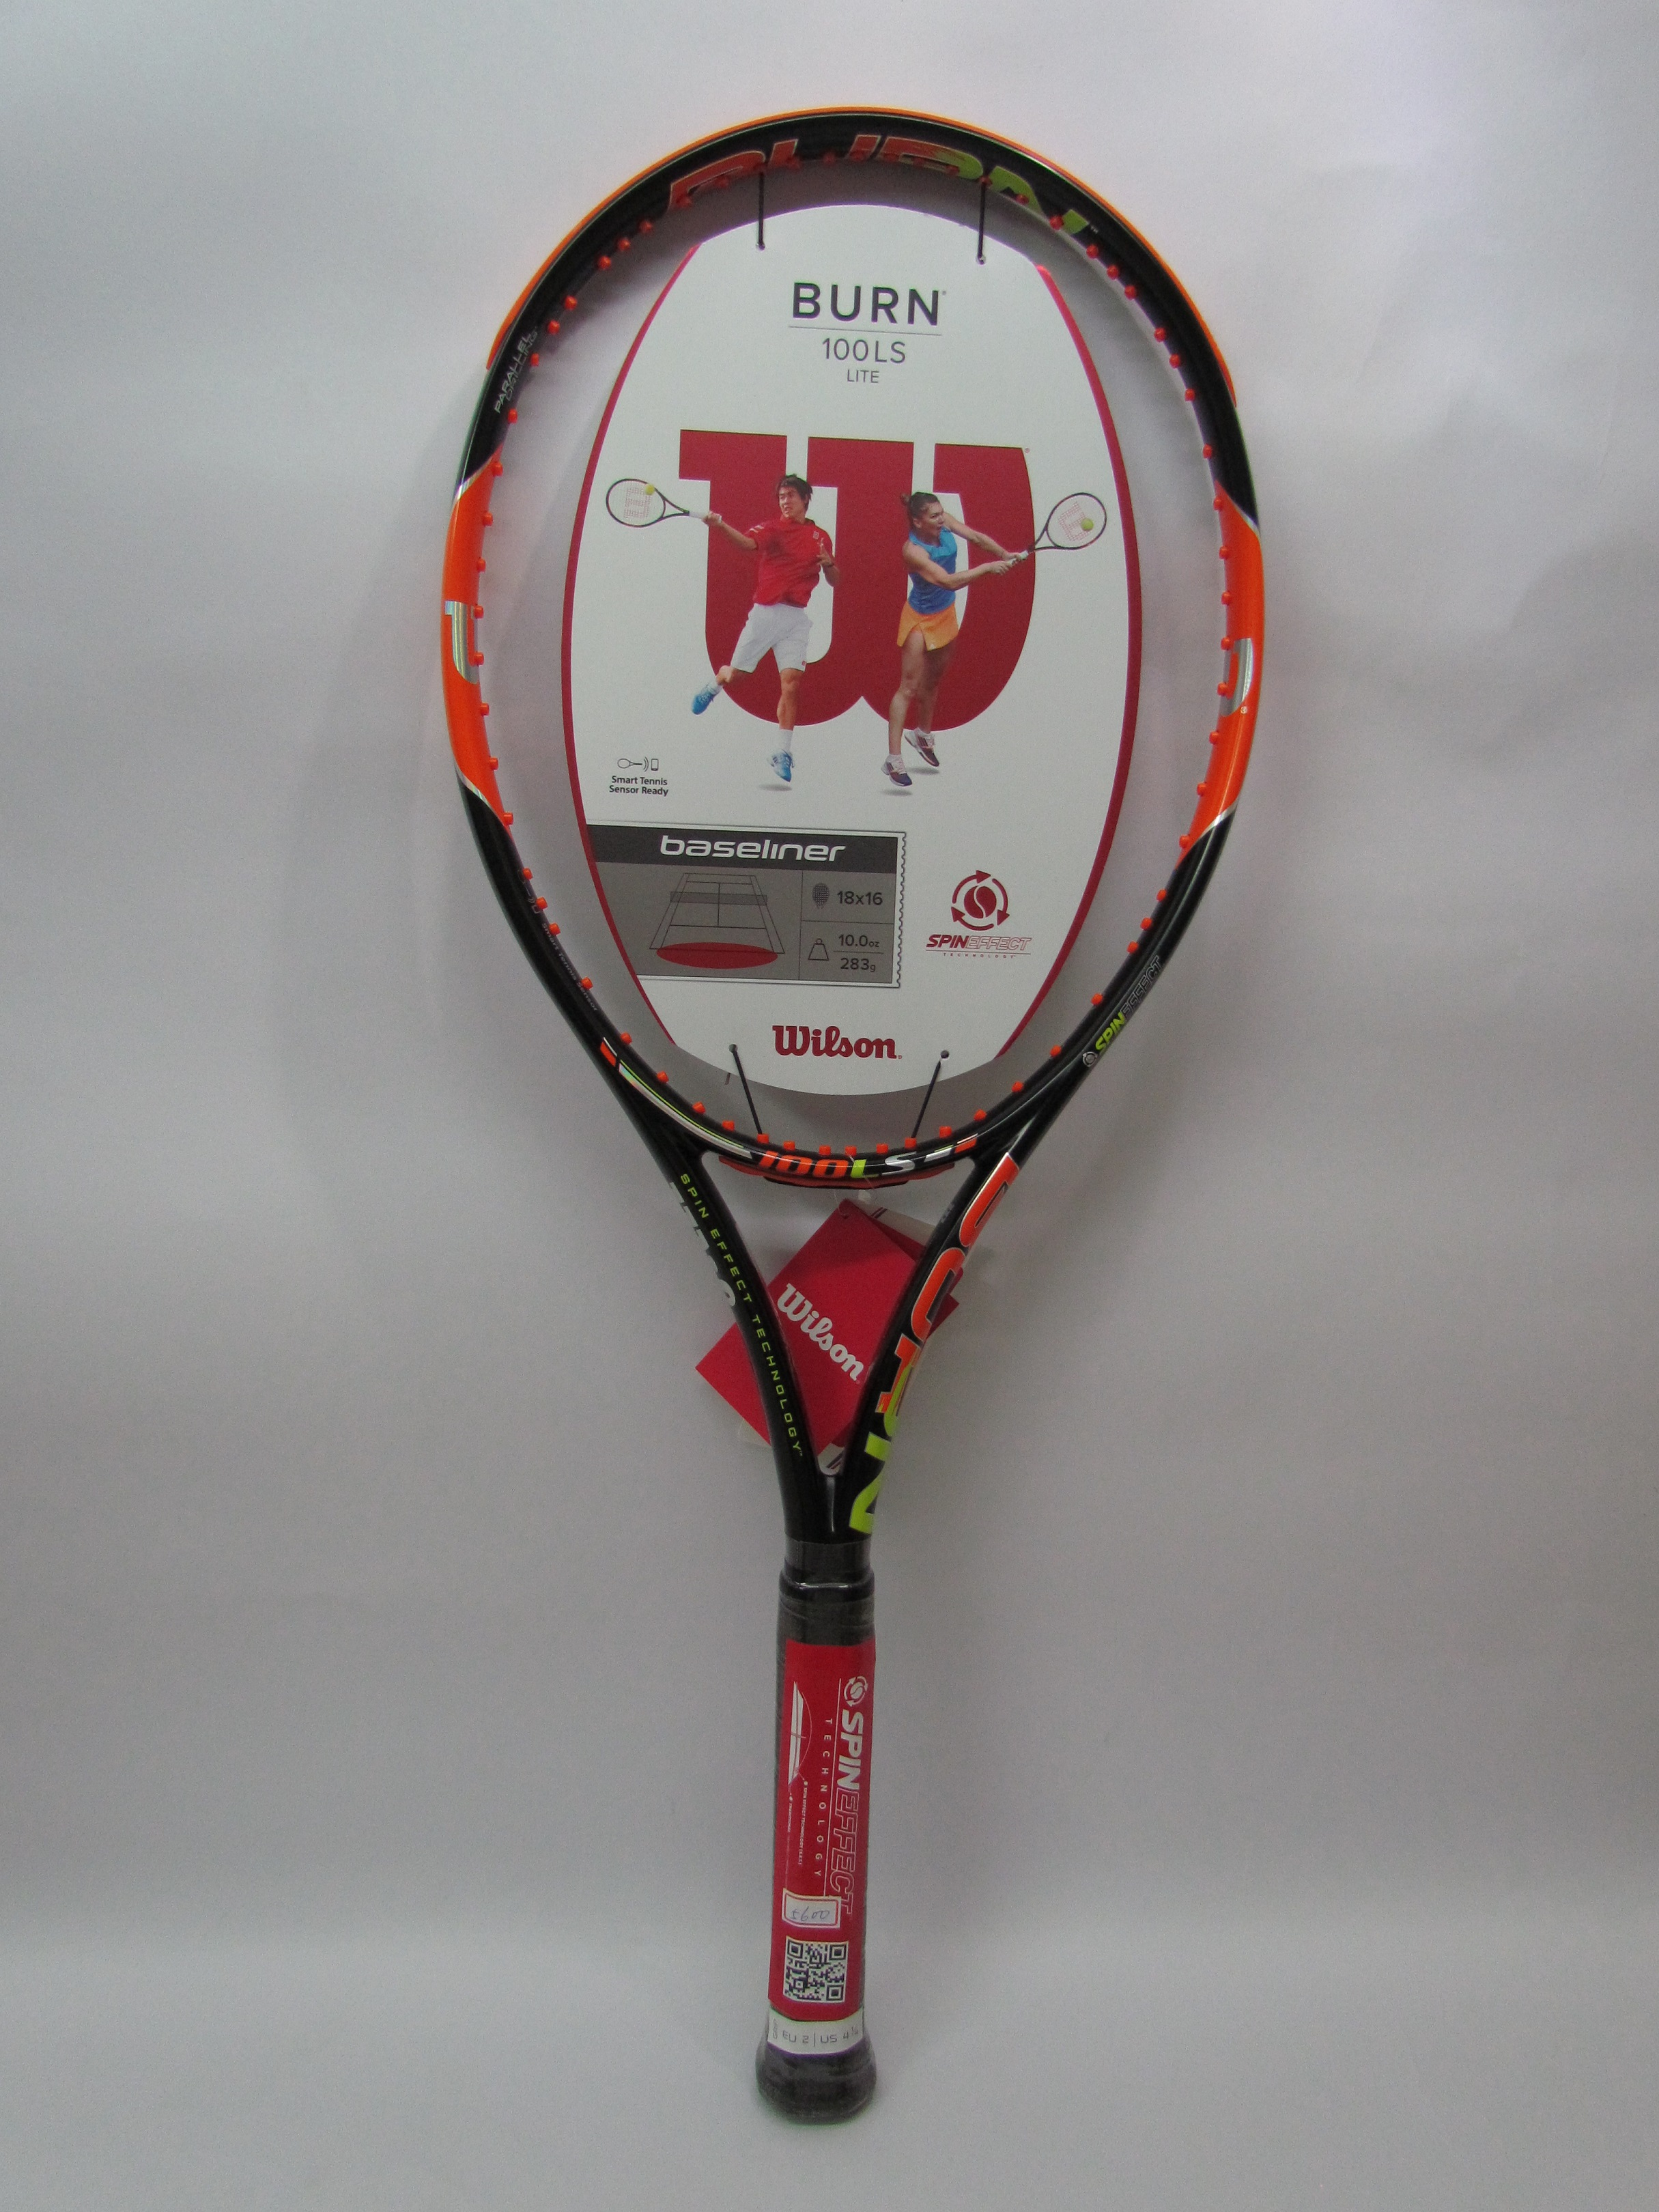 Wilson專業網球拍 Nishikori款 Burn 100 LS 2015年款